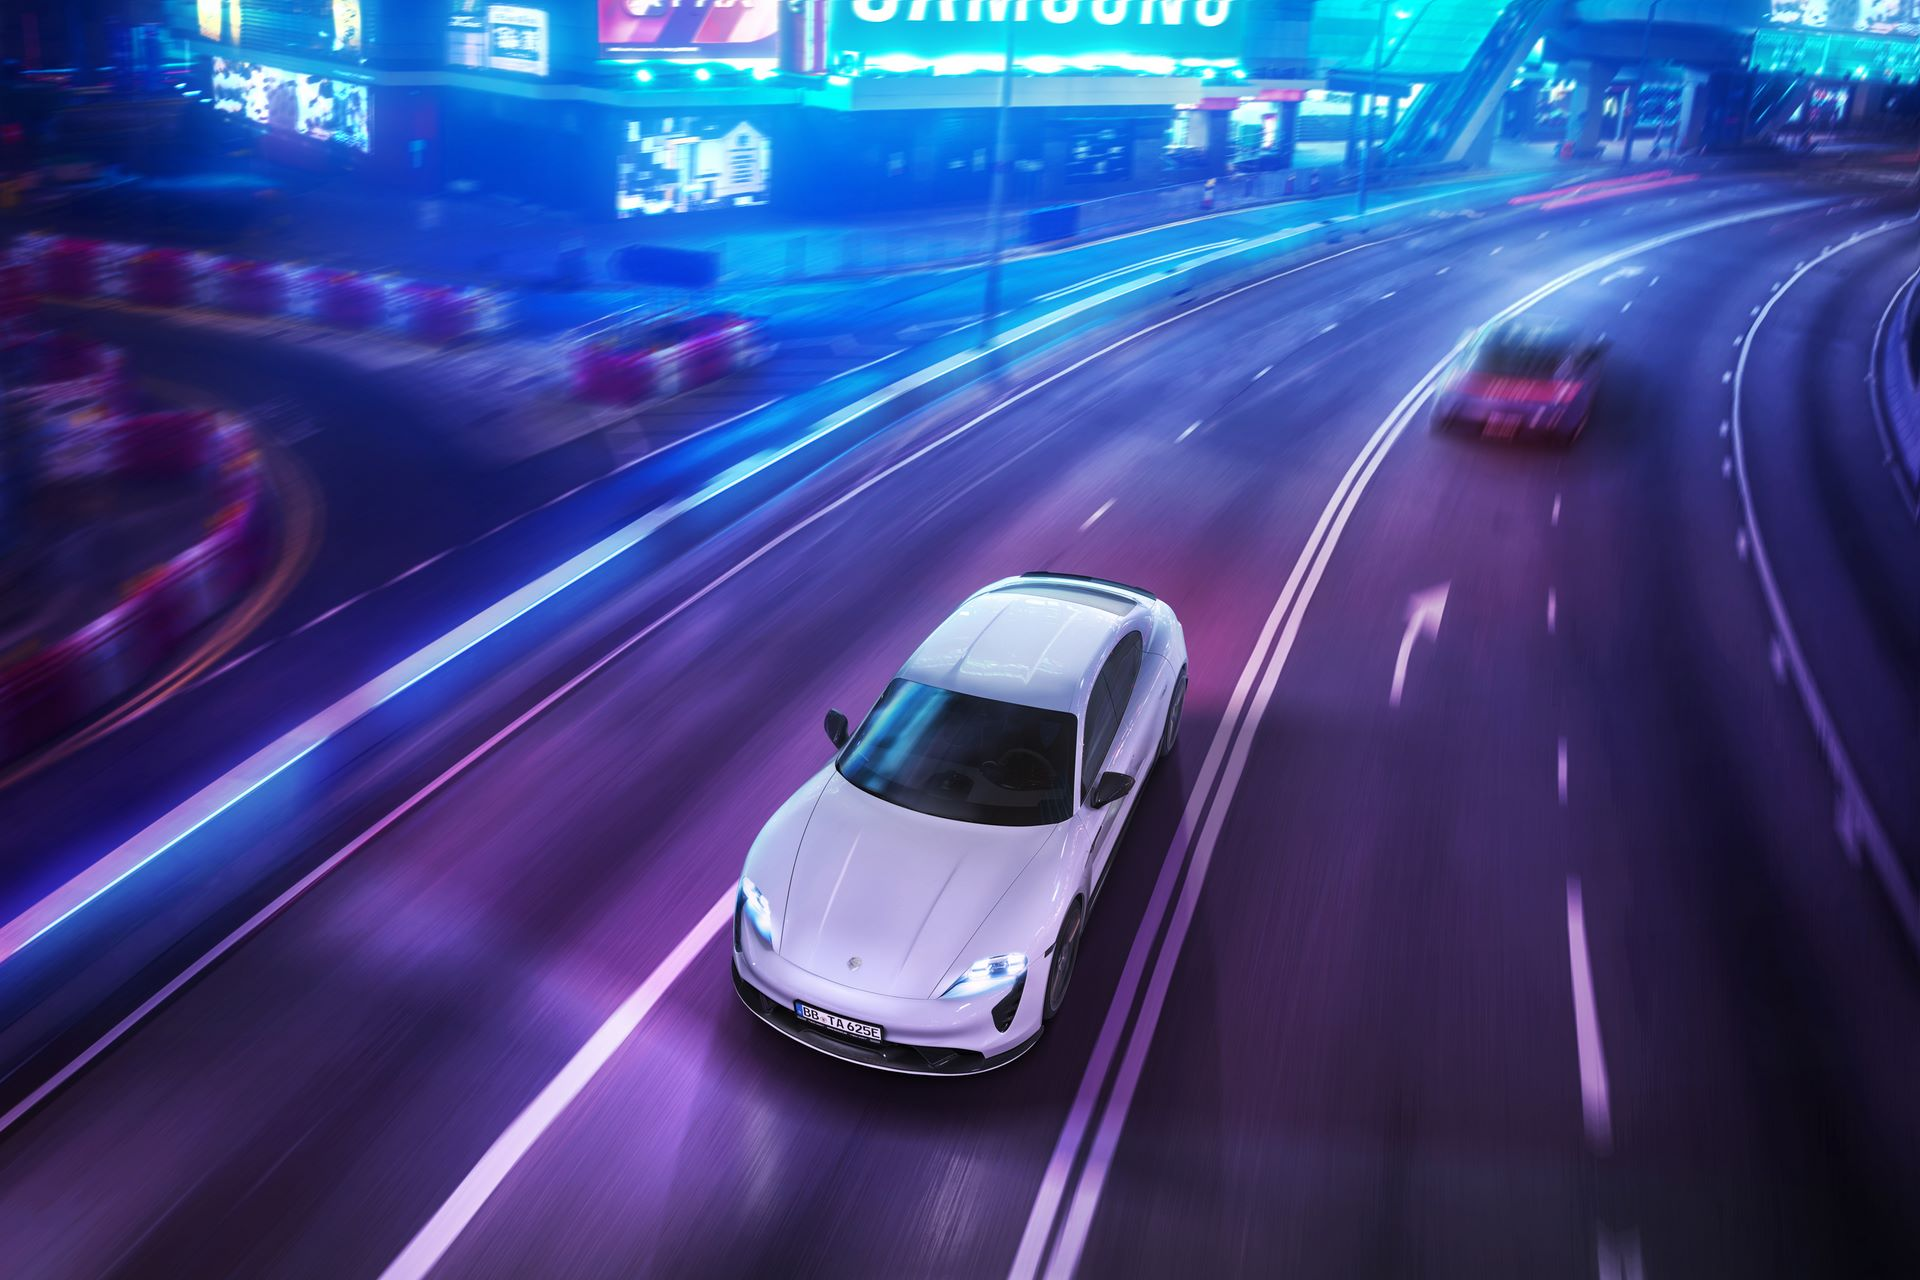 Porsche-Taycan-bodykit-by-TechArt-10